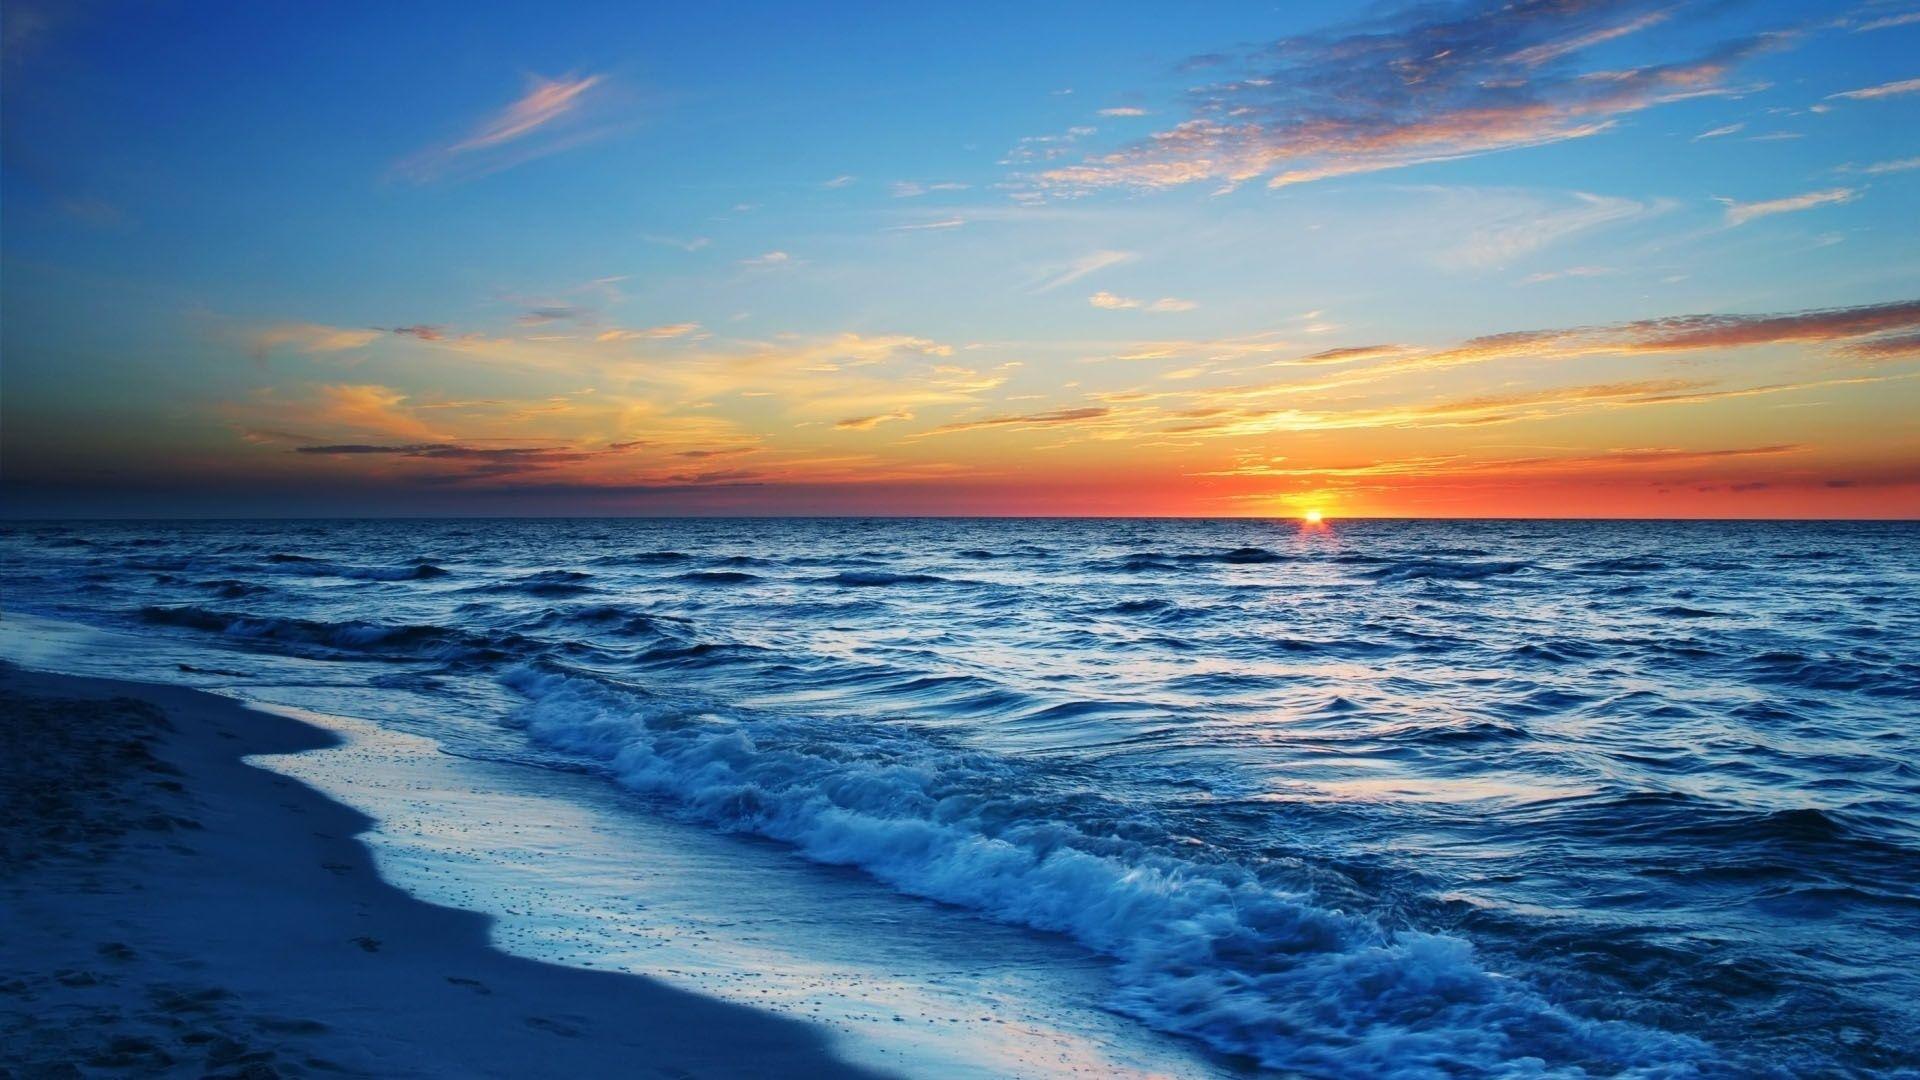 Ocean Themed 1080p Wallpaper